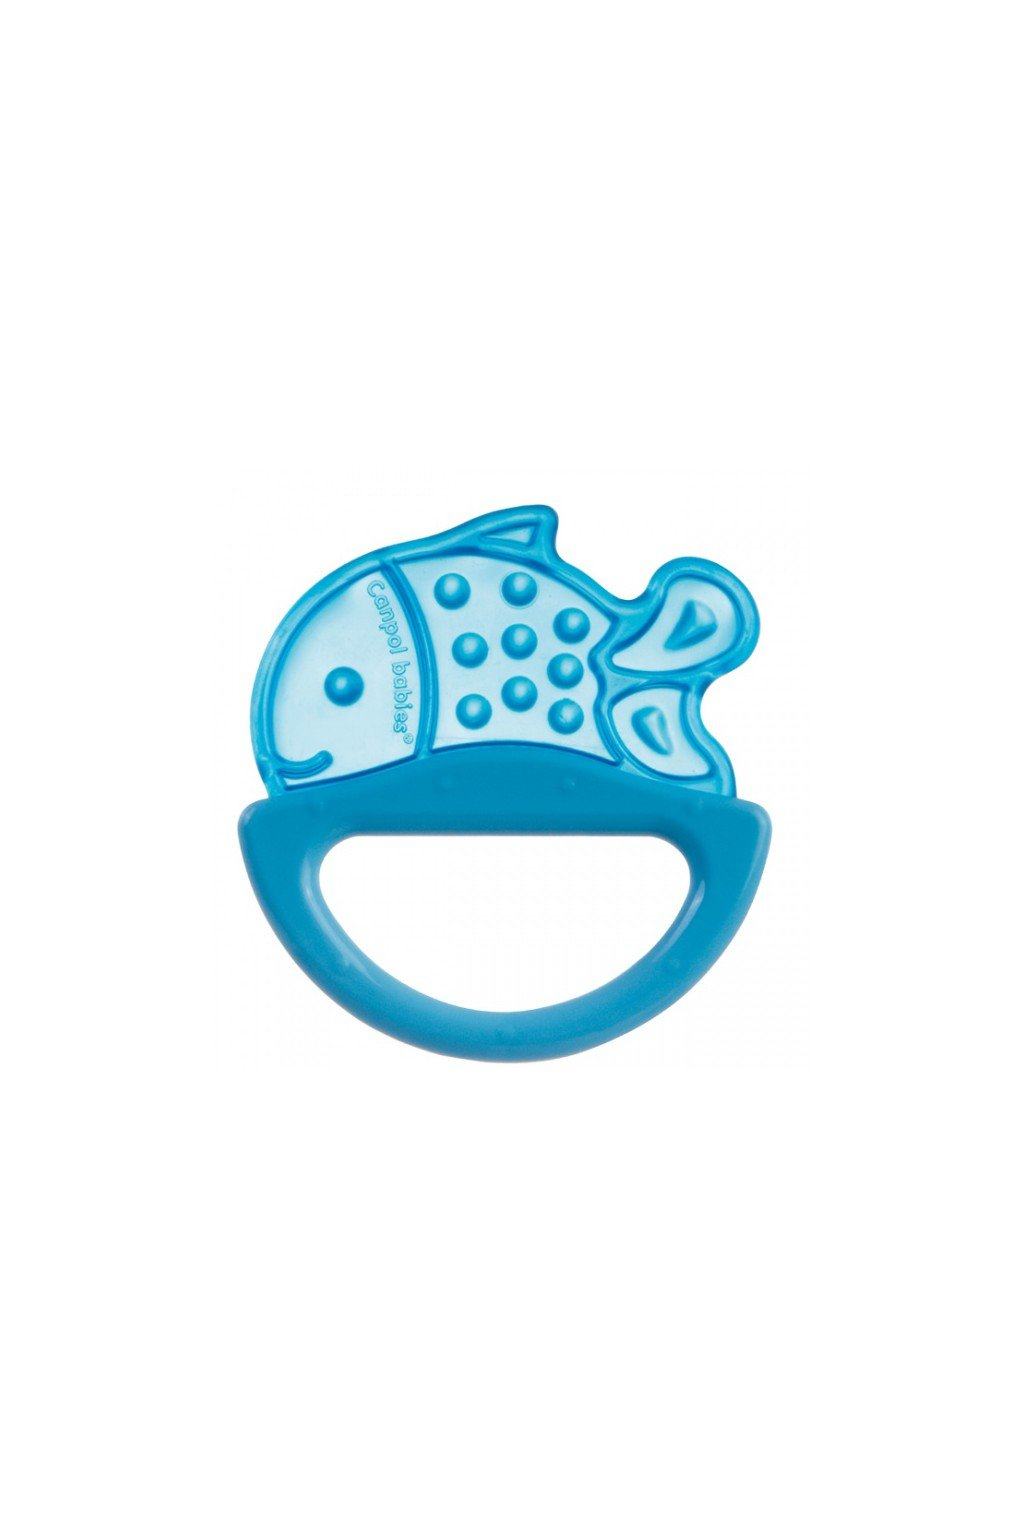 canpol babies chrastitko s kousatkem zviratko (4)